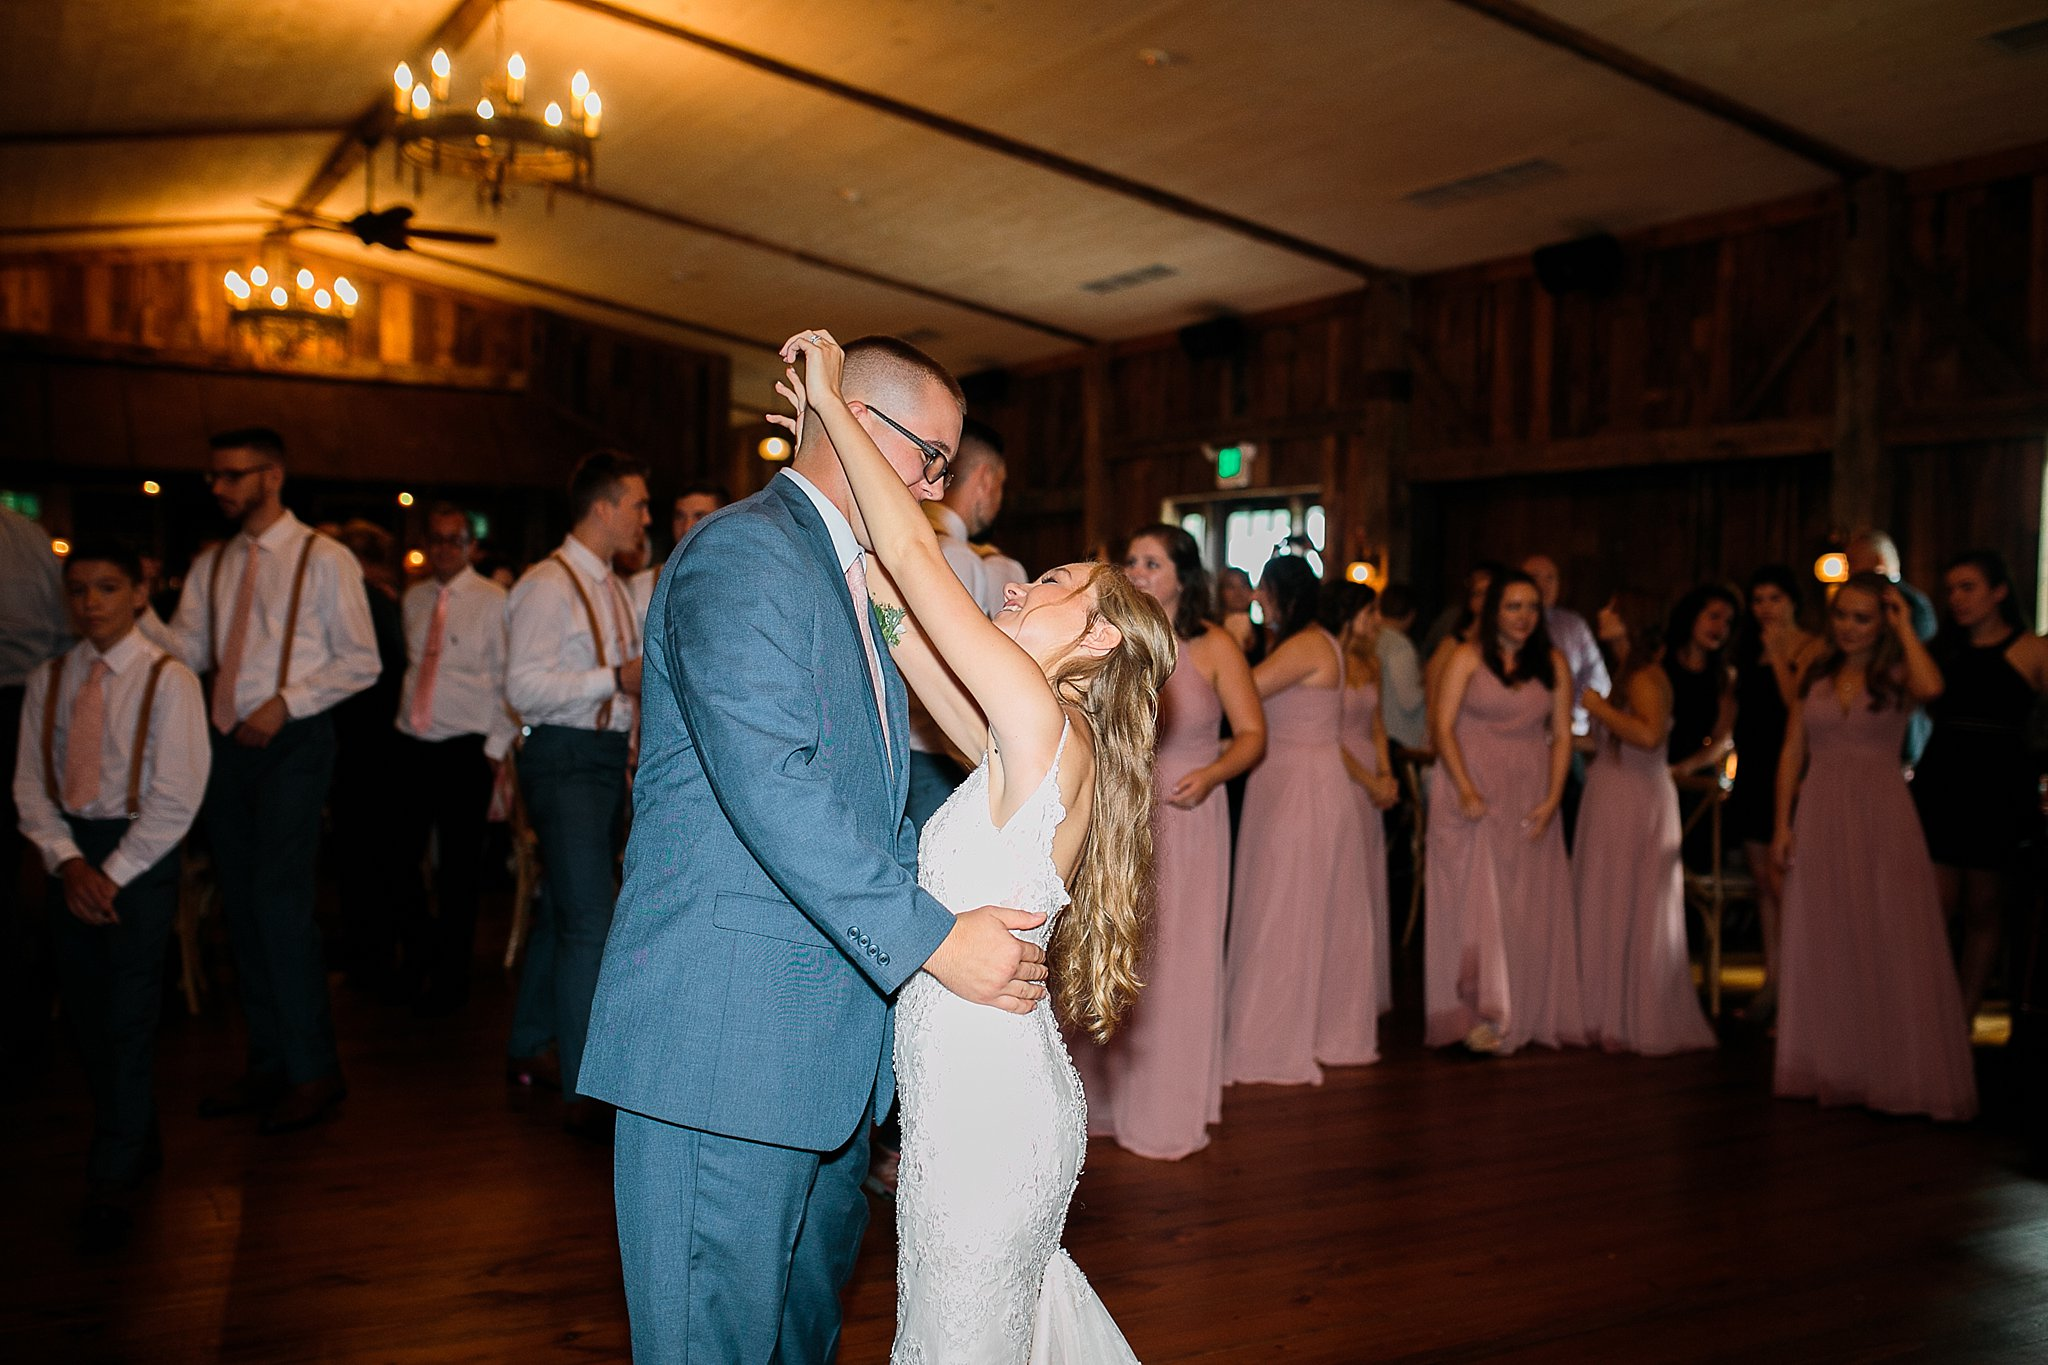 Preston Barn Old Drovers Inn Wedding Rustic Wedding Hudson Valley Photographer Sweet Alice Photography79.jpg